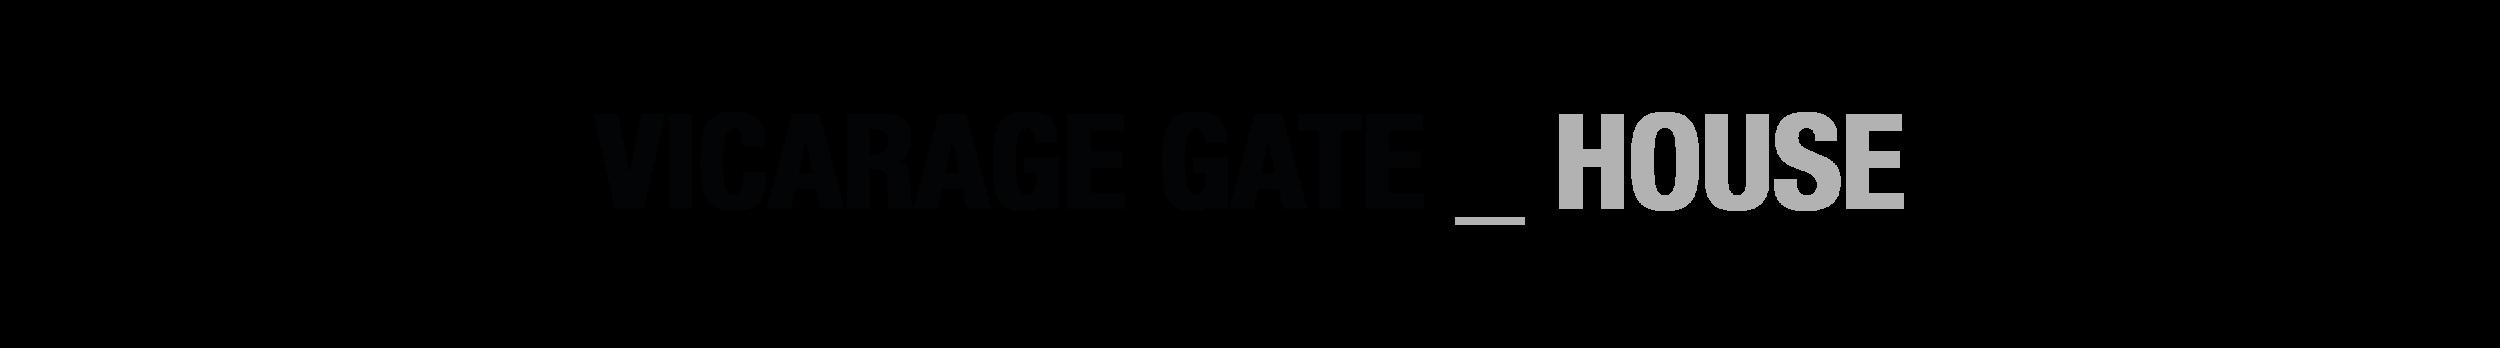 Portfolio Title_VICARAGE GATE _ HOUSE.png